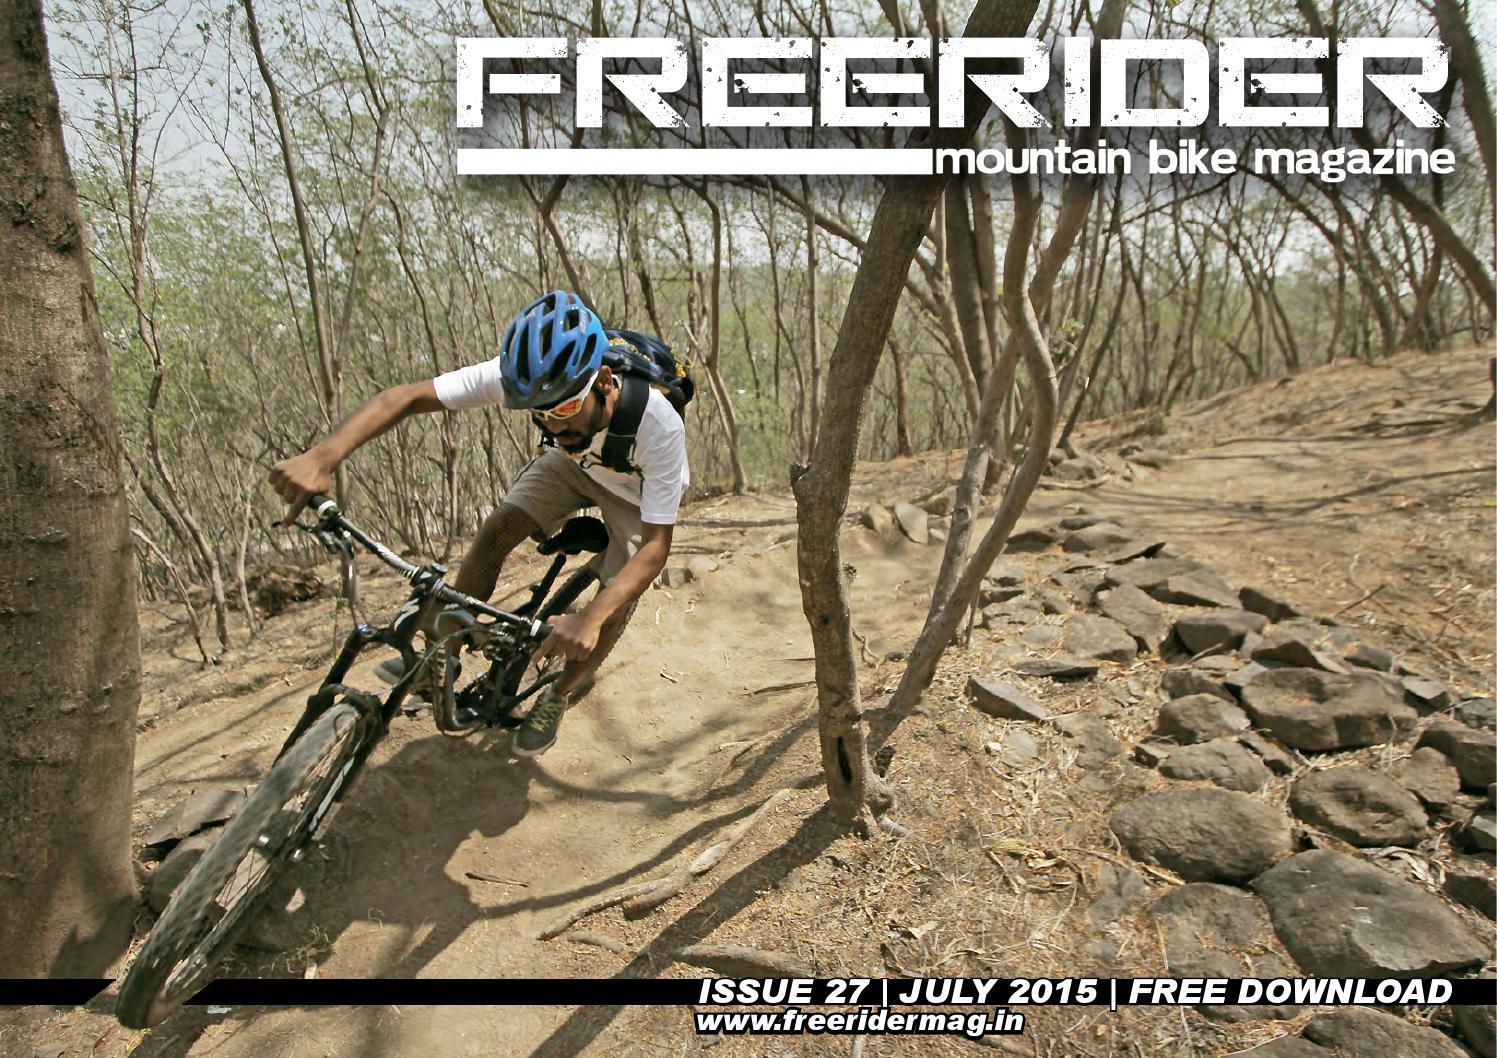 Back Issues IMB Free Mountain Bike Magazine Online